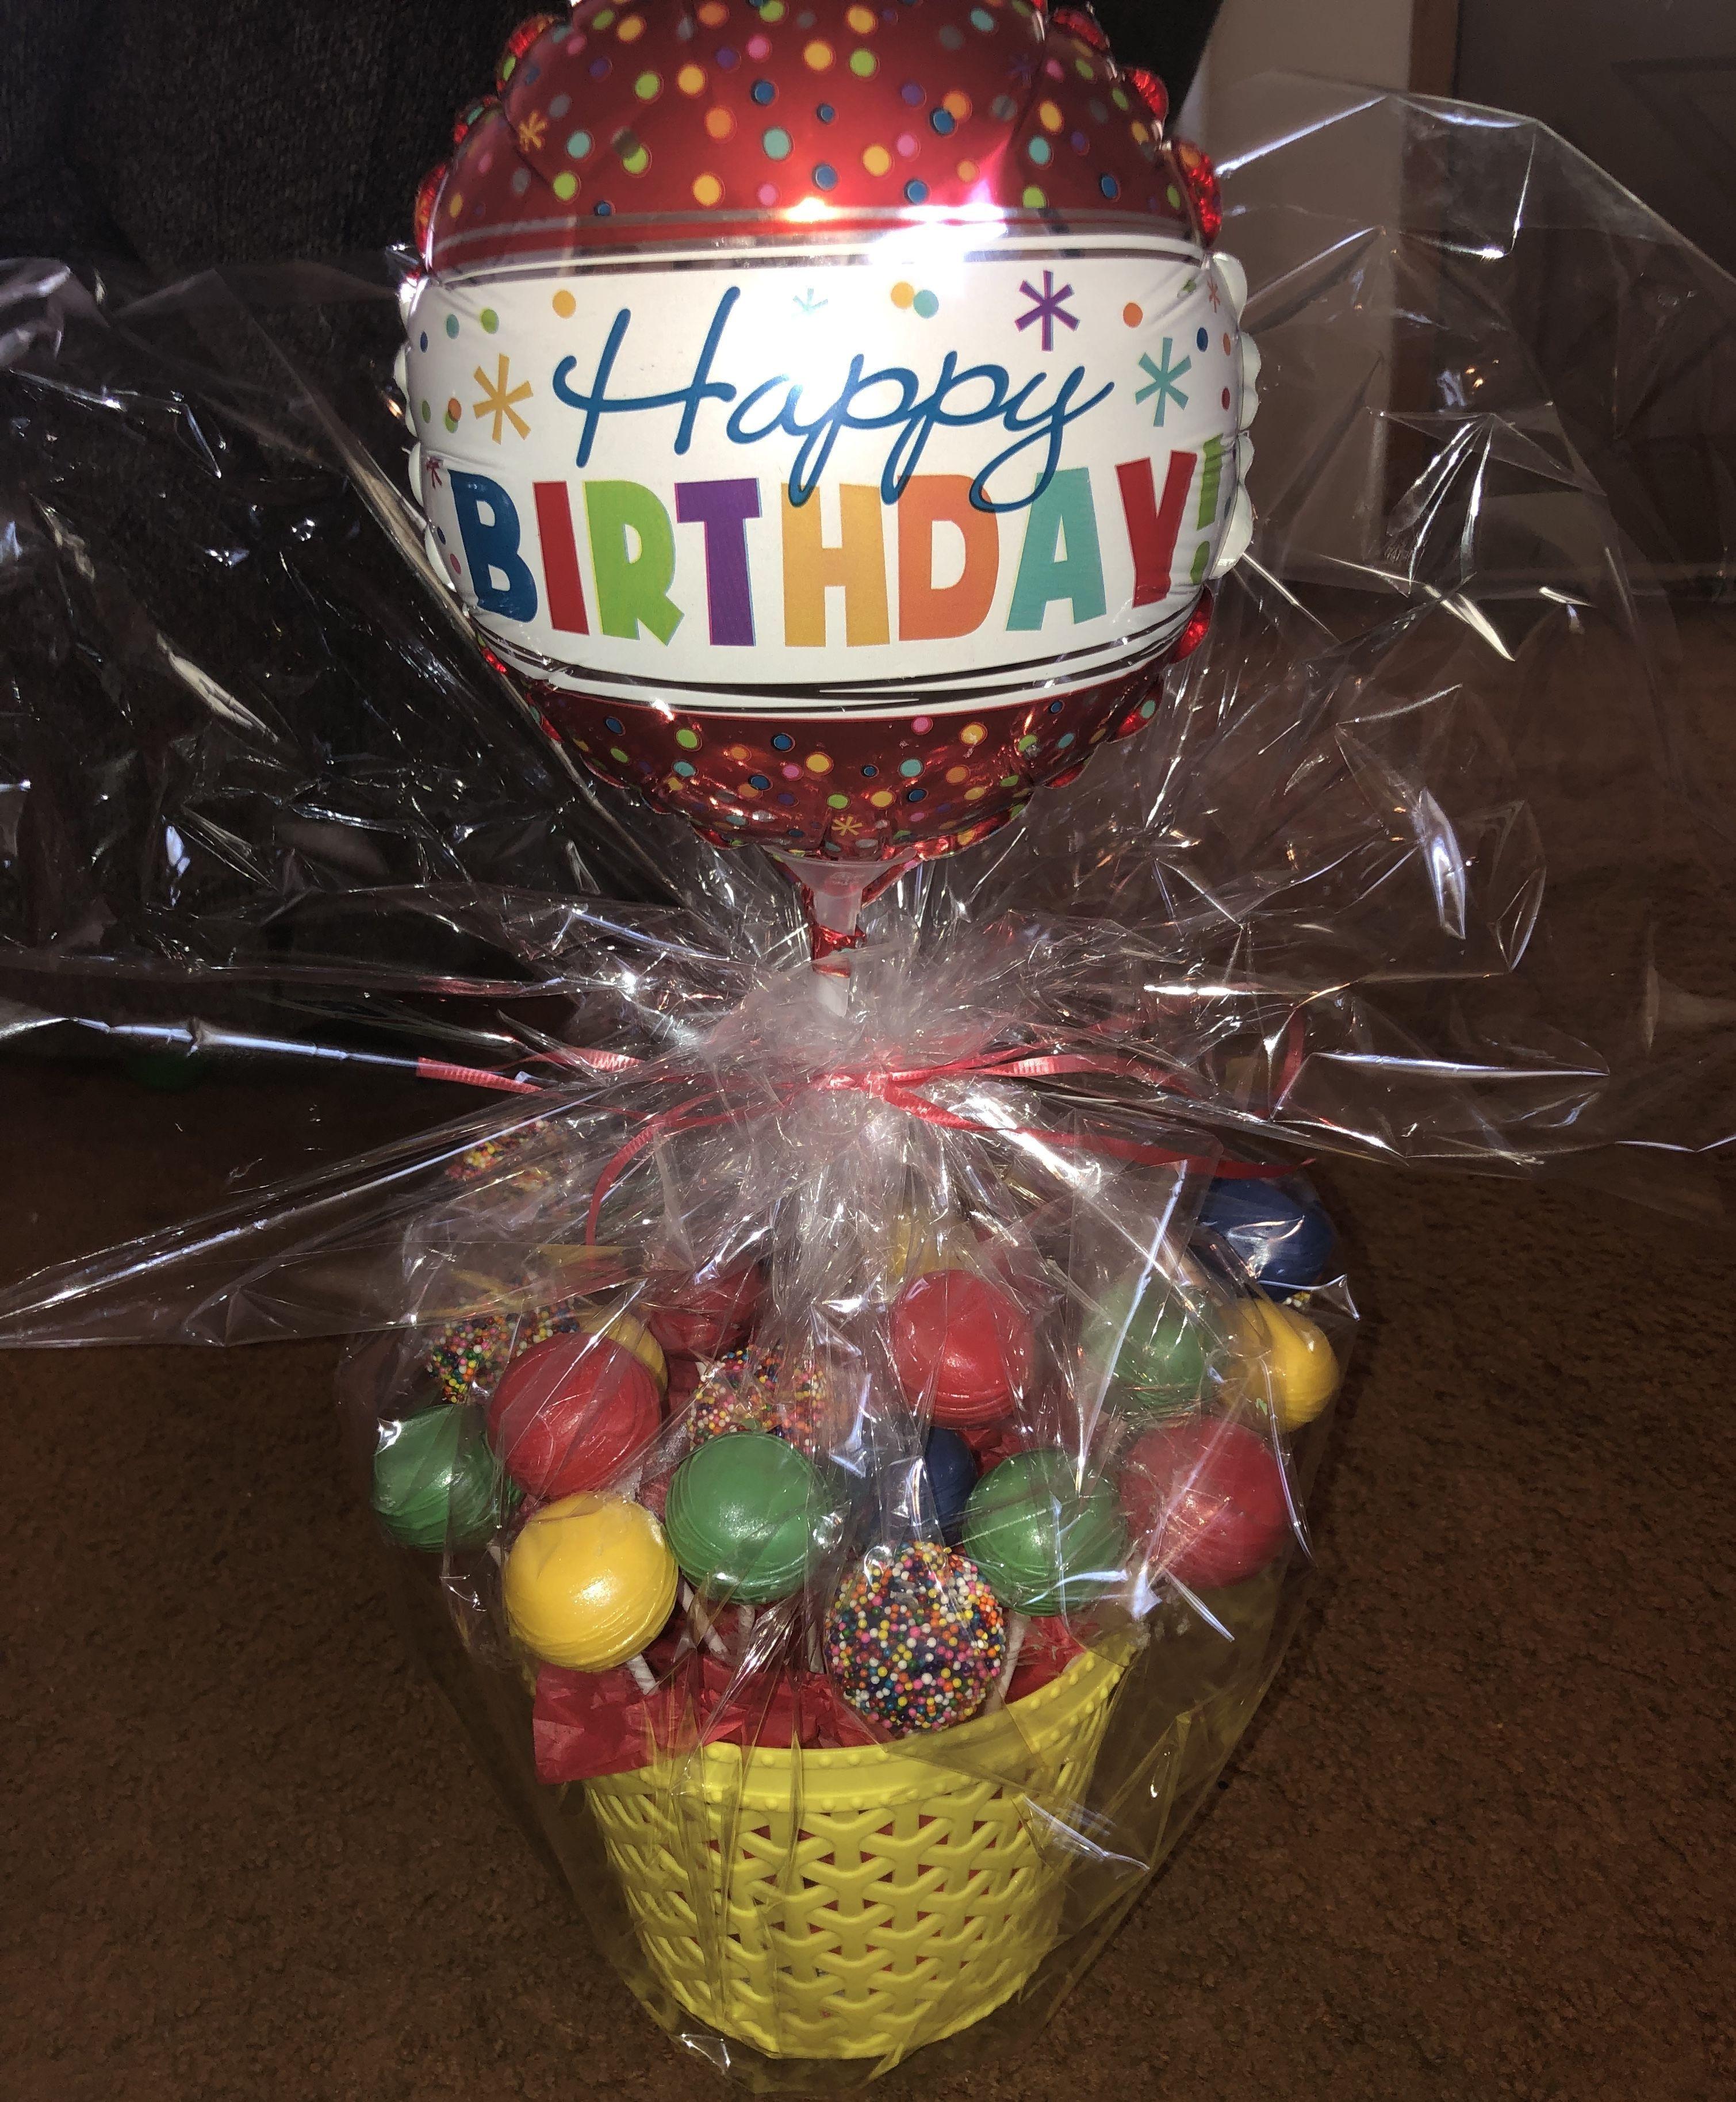 Birthday cake pop bouquet  #cakepopbouquet Birthday cake pop bouquet #cakepopbouquet Birthday cake pop bouquet  #cakepopbouquet Birthday cake pop bouquet #cakepopbouquet Birthday cake pop bouquet  #cakepopbouquet Birthday cake pop bouquet #cakepopbouquet Birthday cake pop bouquet  #cakepopbouquet Birthday cake pop bouquet #cakepopbouquet